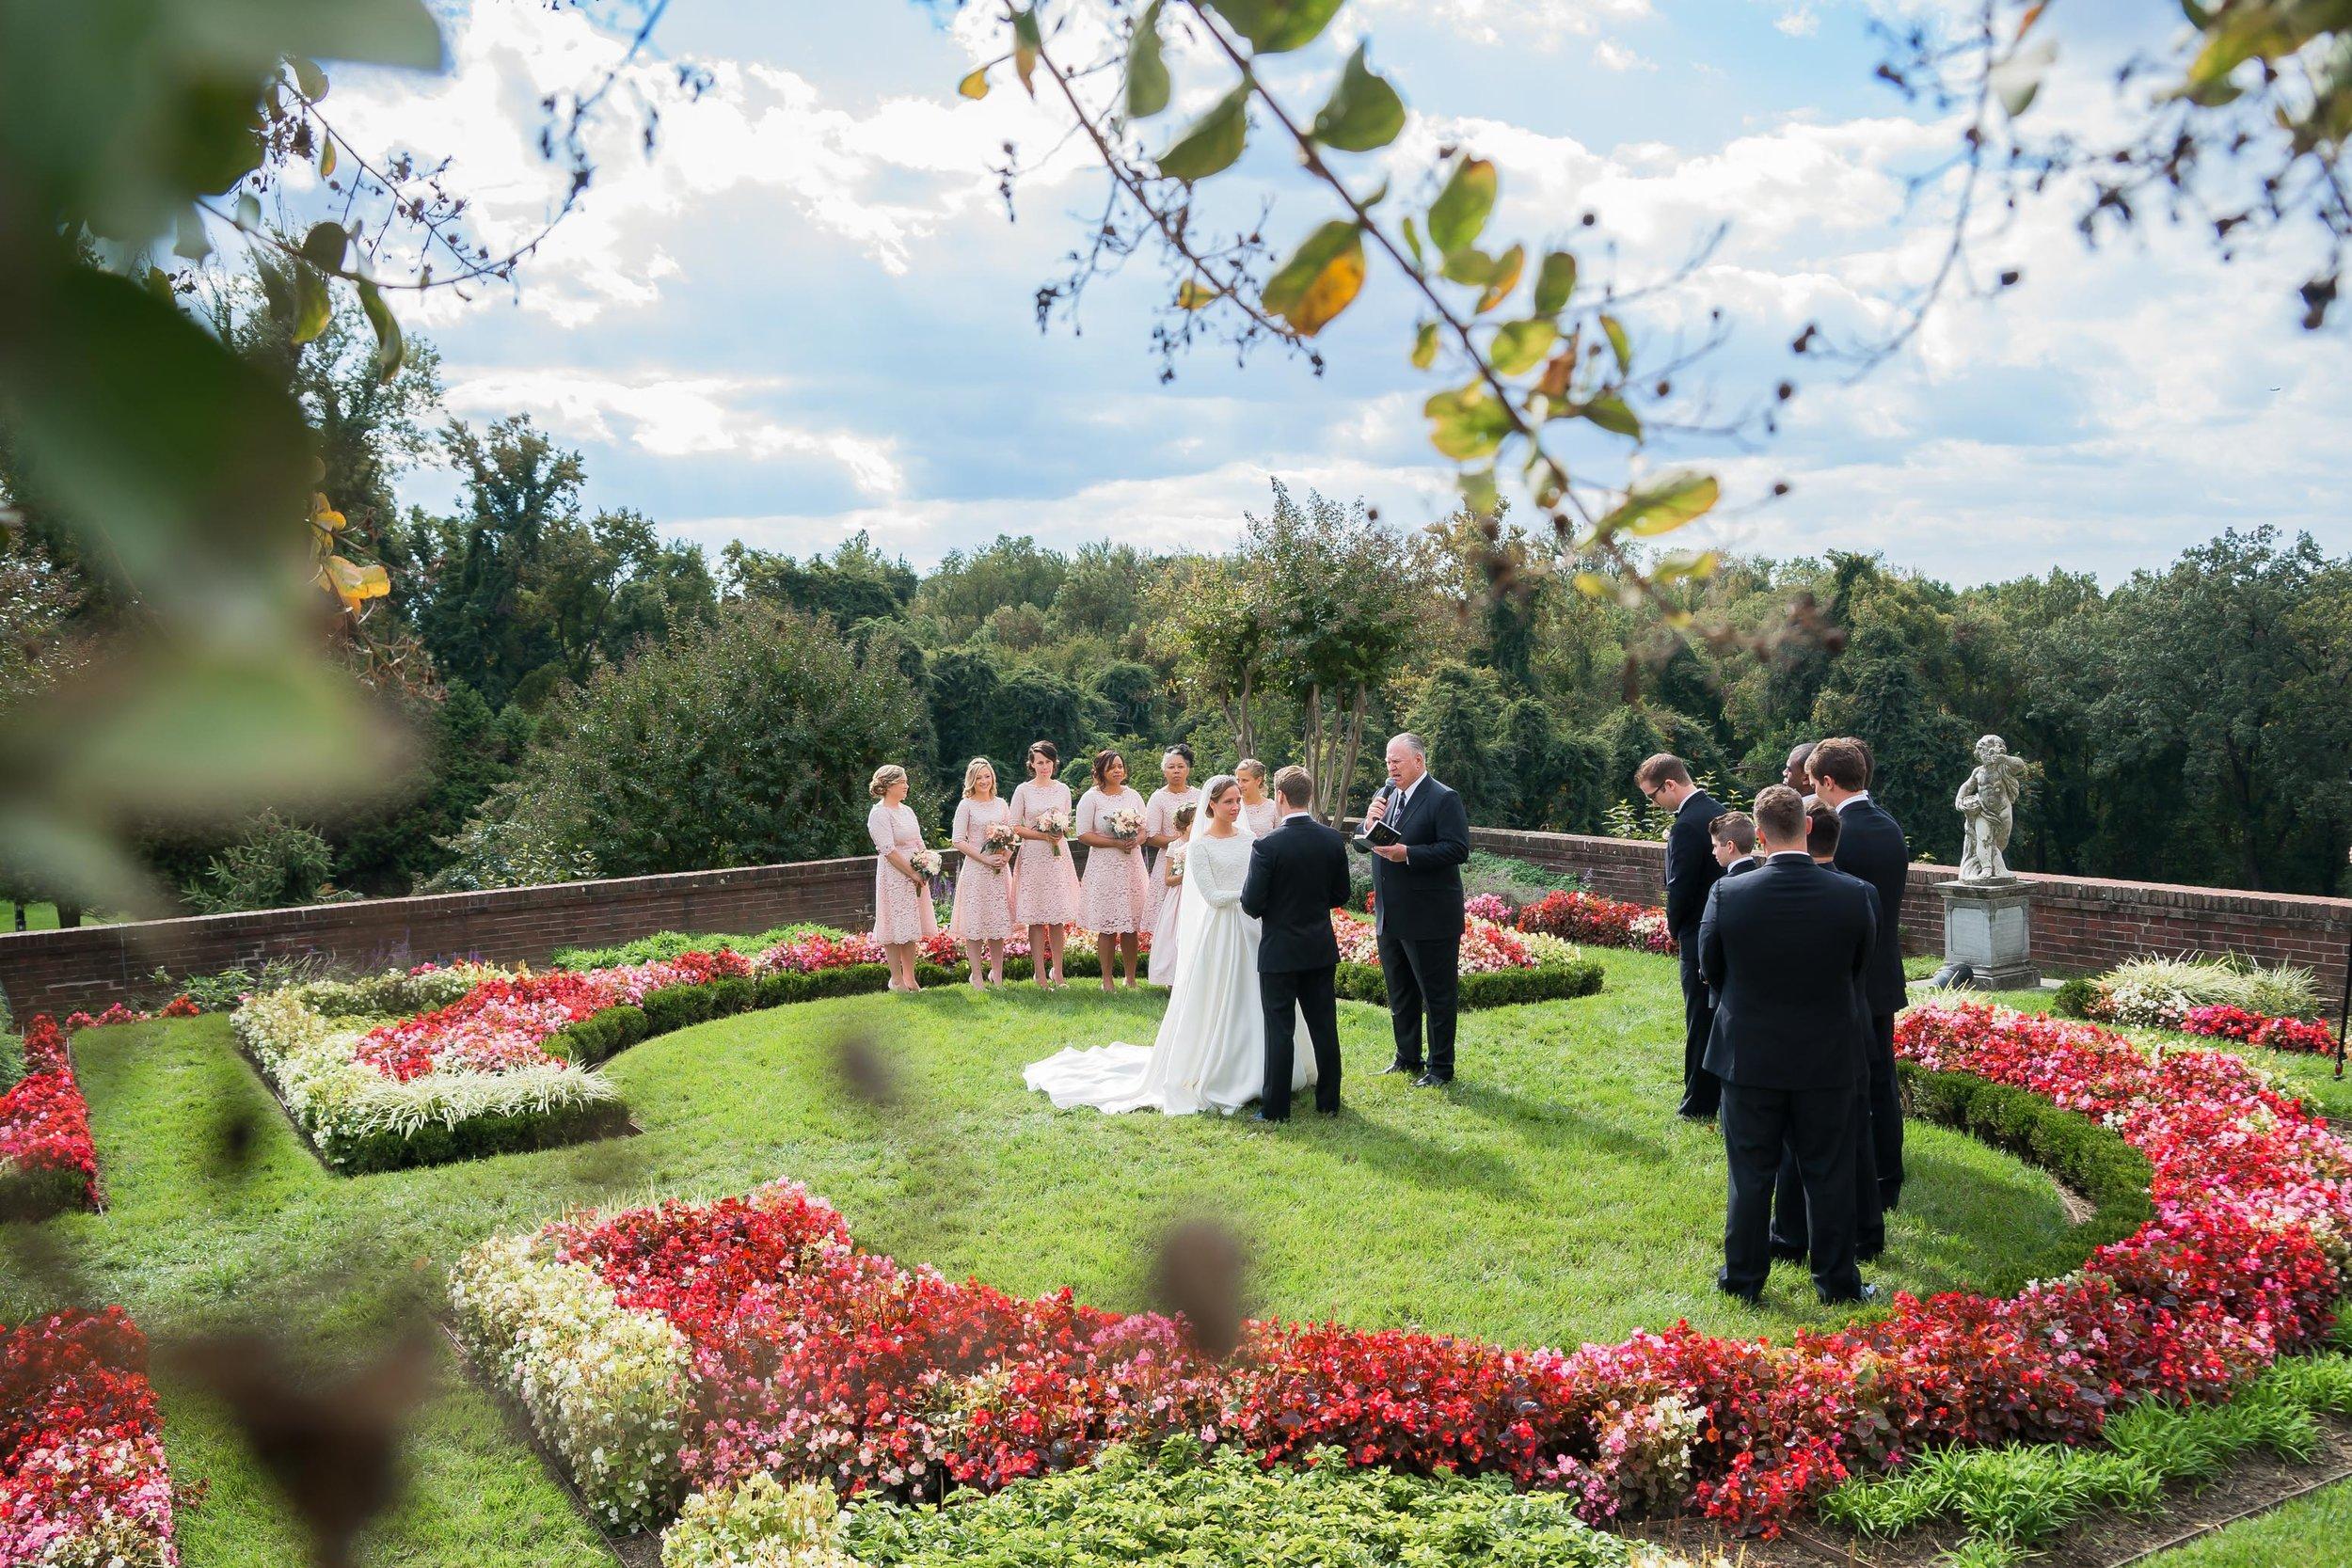 Garden wedding ceremony at Oxon Hill Manor by jessica nazarova